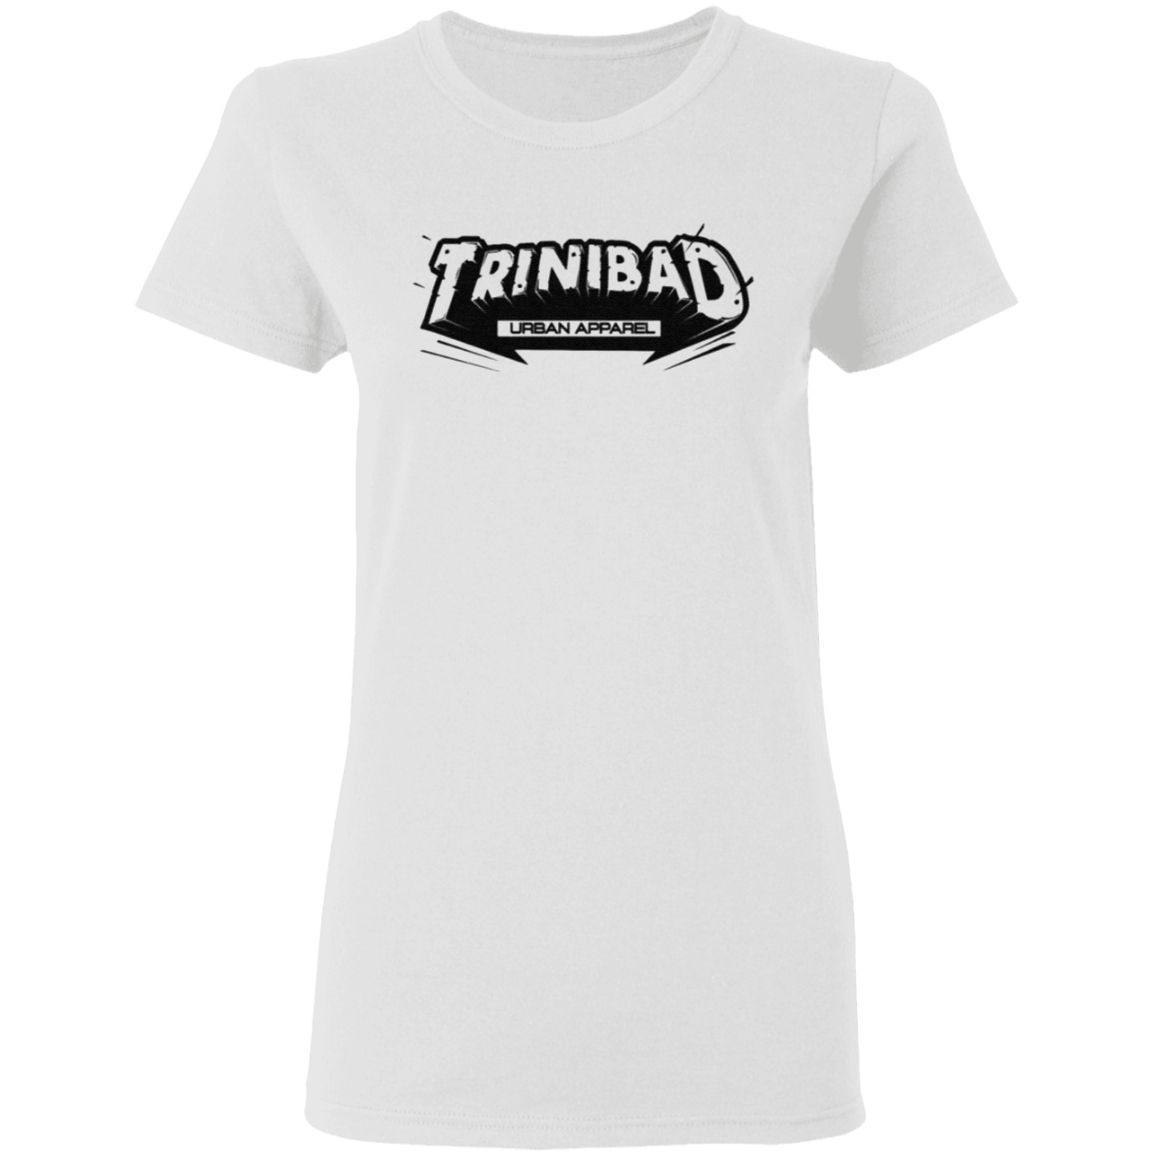 TriniBad Urban Apparel T Shirt